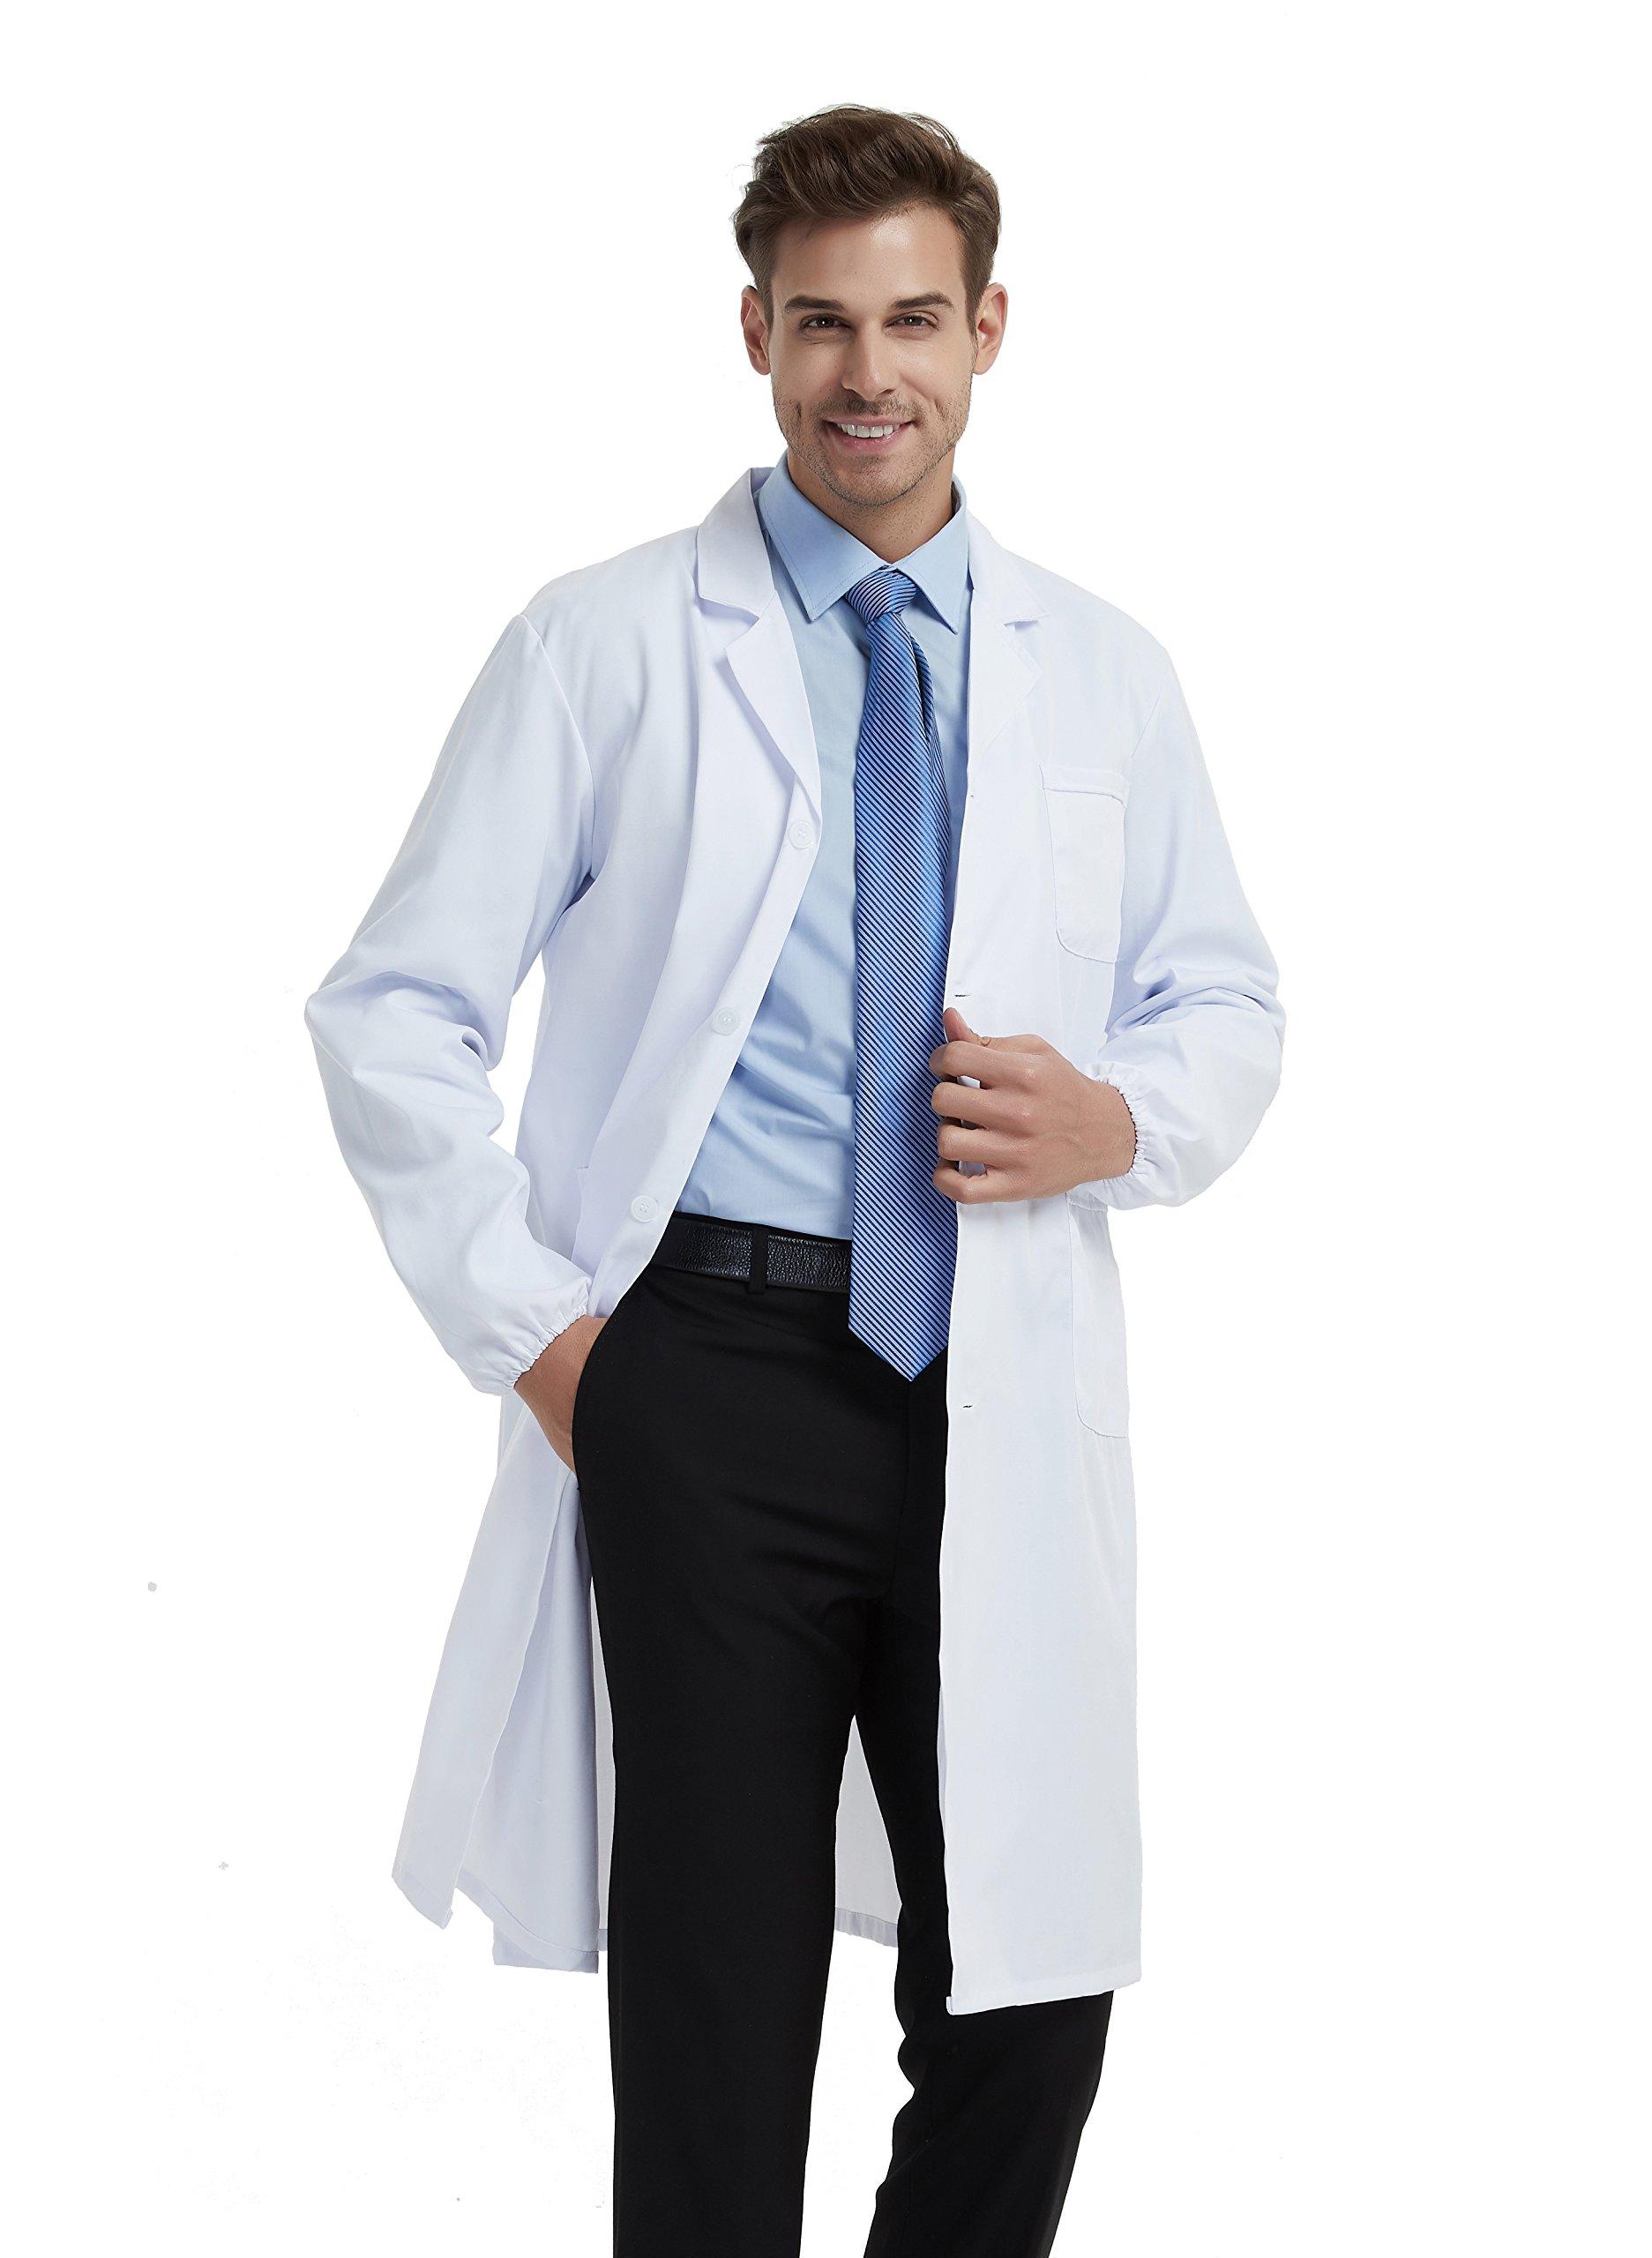 BSTT Men Lab Coat White Medical Uniforms Scrubs 2018 New Improvement Elastic Sleeves Thin S